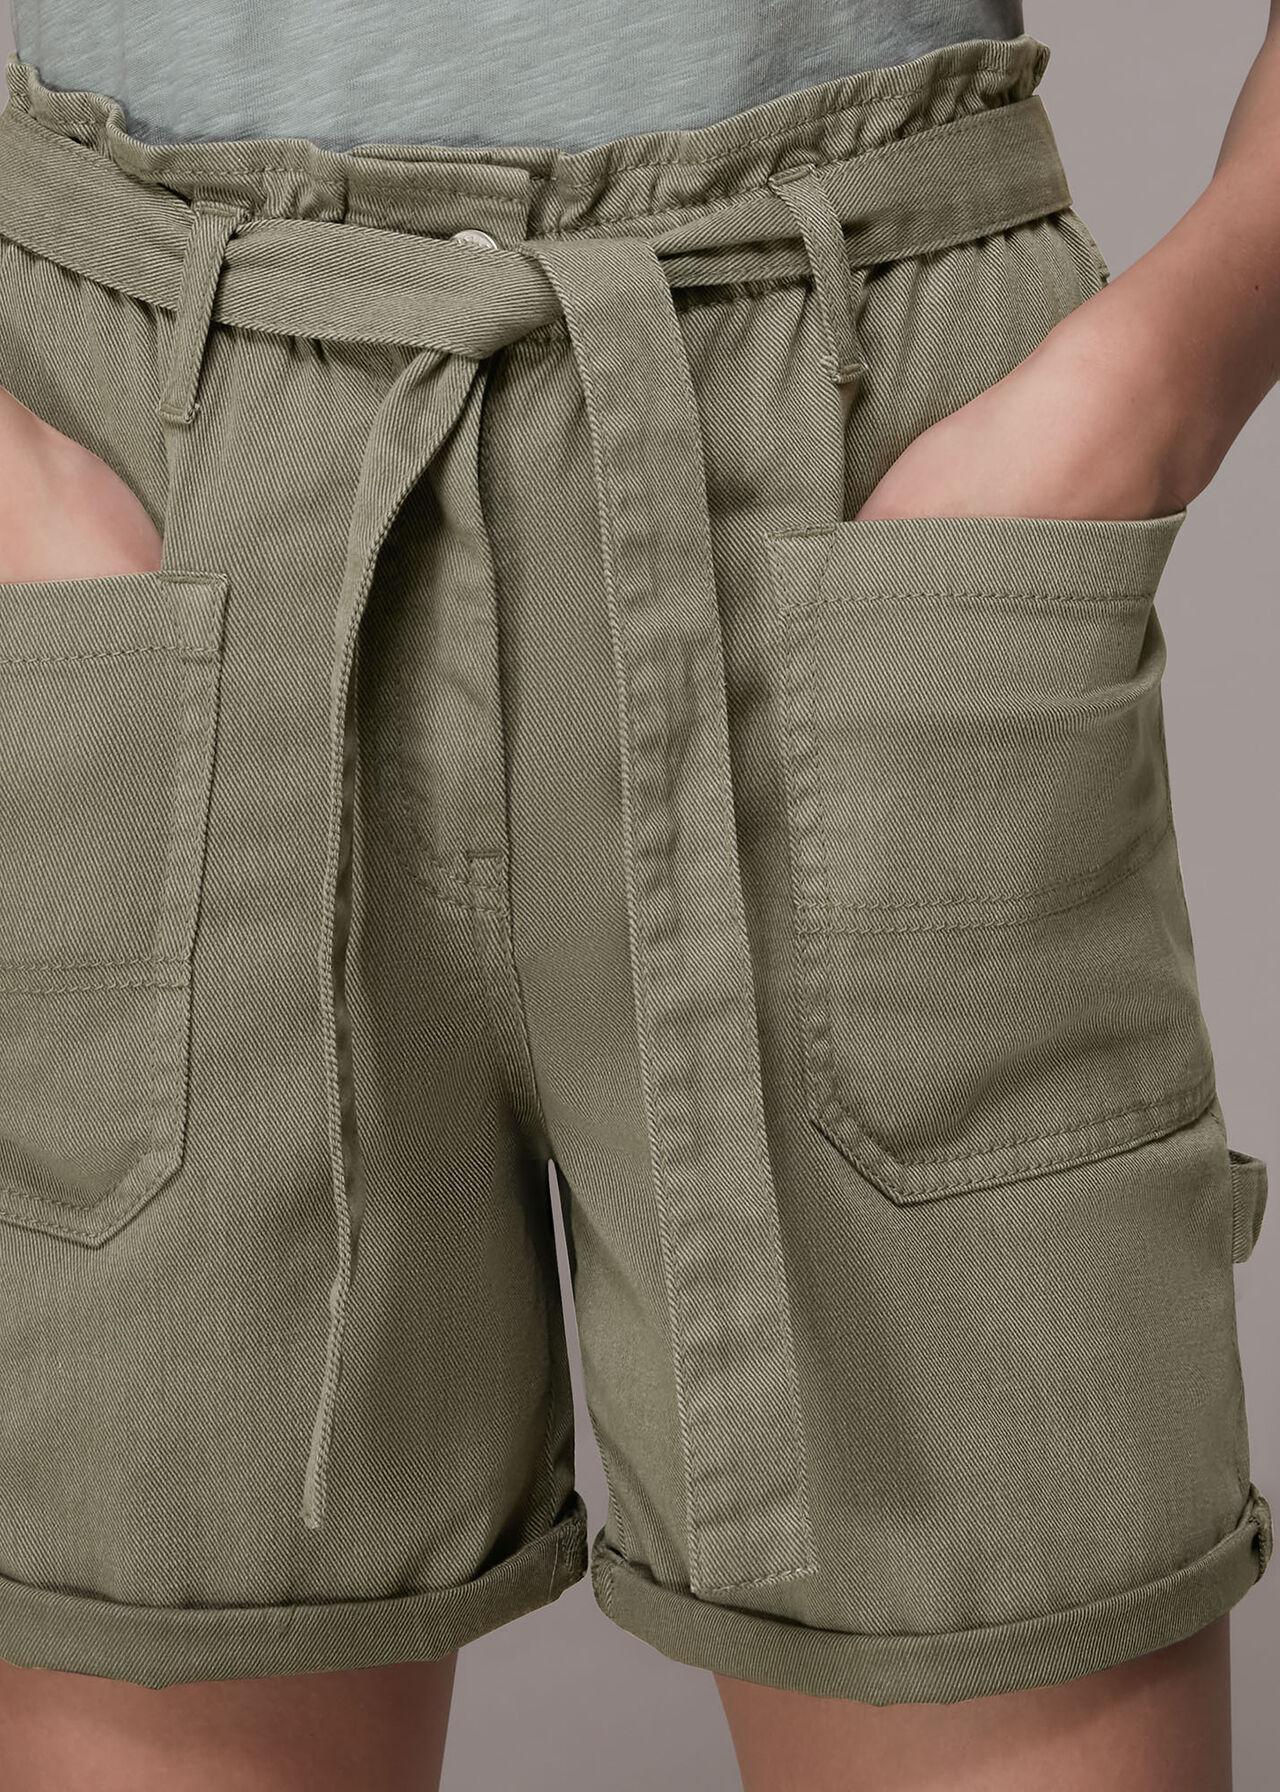 Tie Waist Cargo Pocket Short